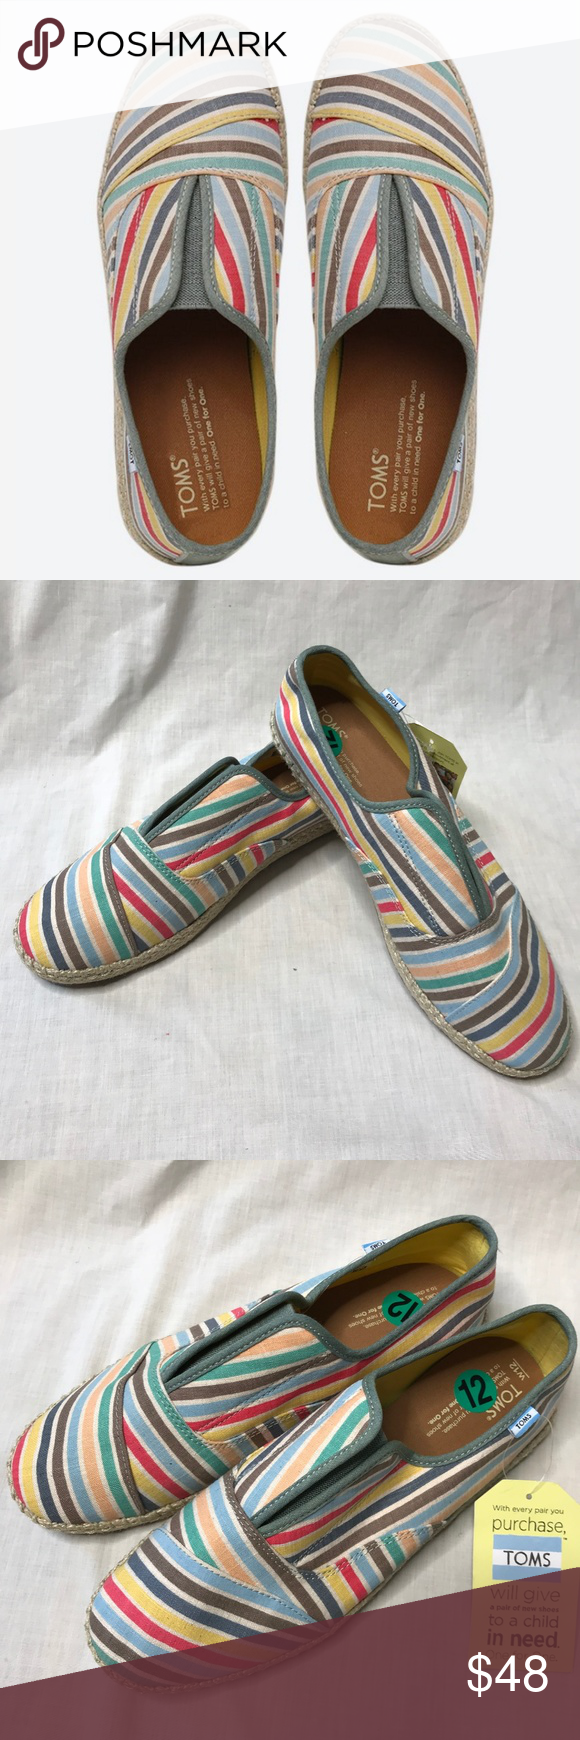 6425b3c3534 Toms Palmera Multi Beach strip Slip-Ons Flat Shoes Toms Womens size W 12 wmn